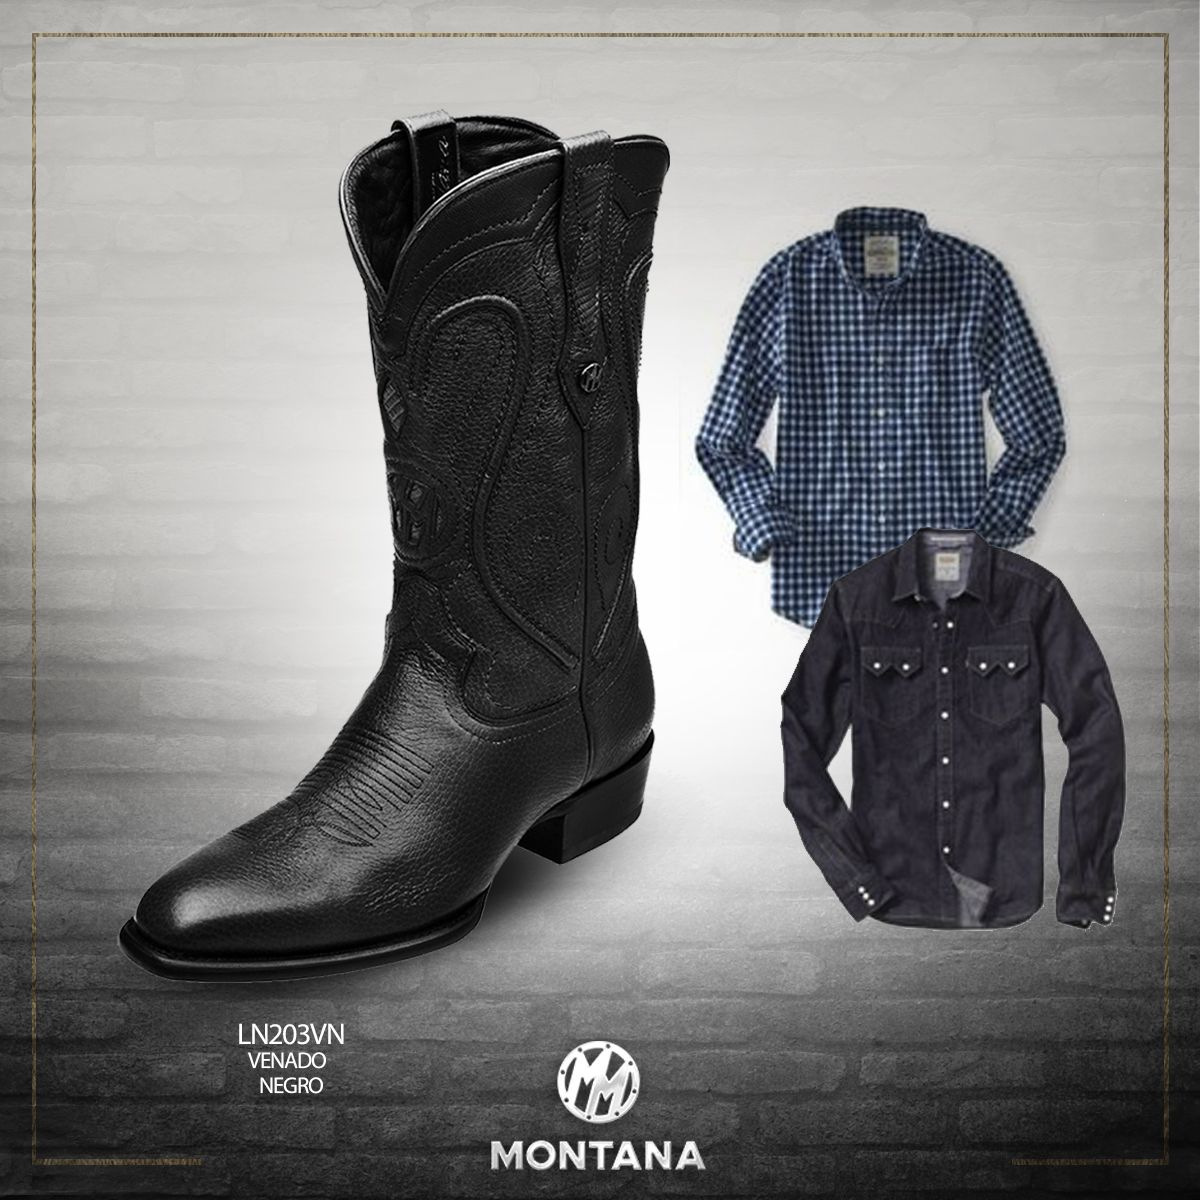 76ab1c32781  Outfit  ProRodeo  Montana  Boots  Botas  Western  Rodeo Botas Vaqueras